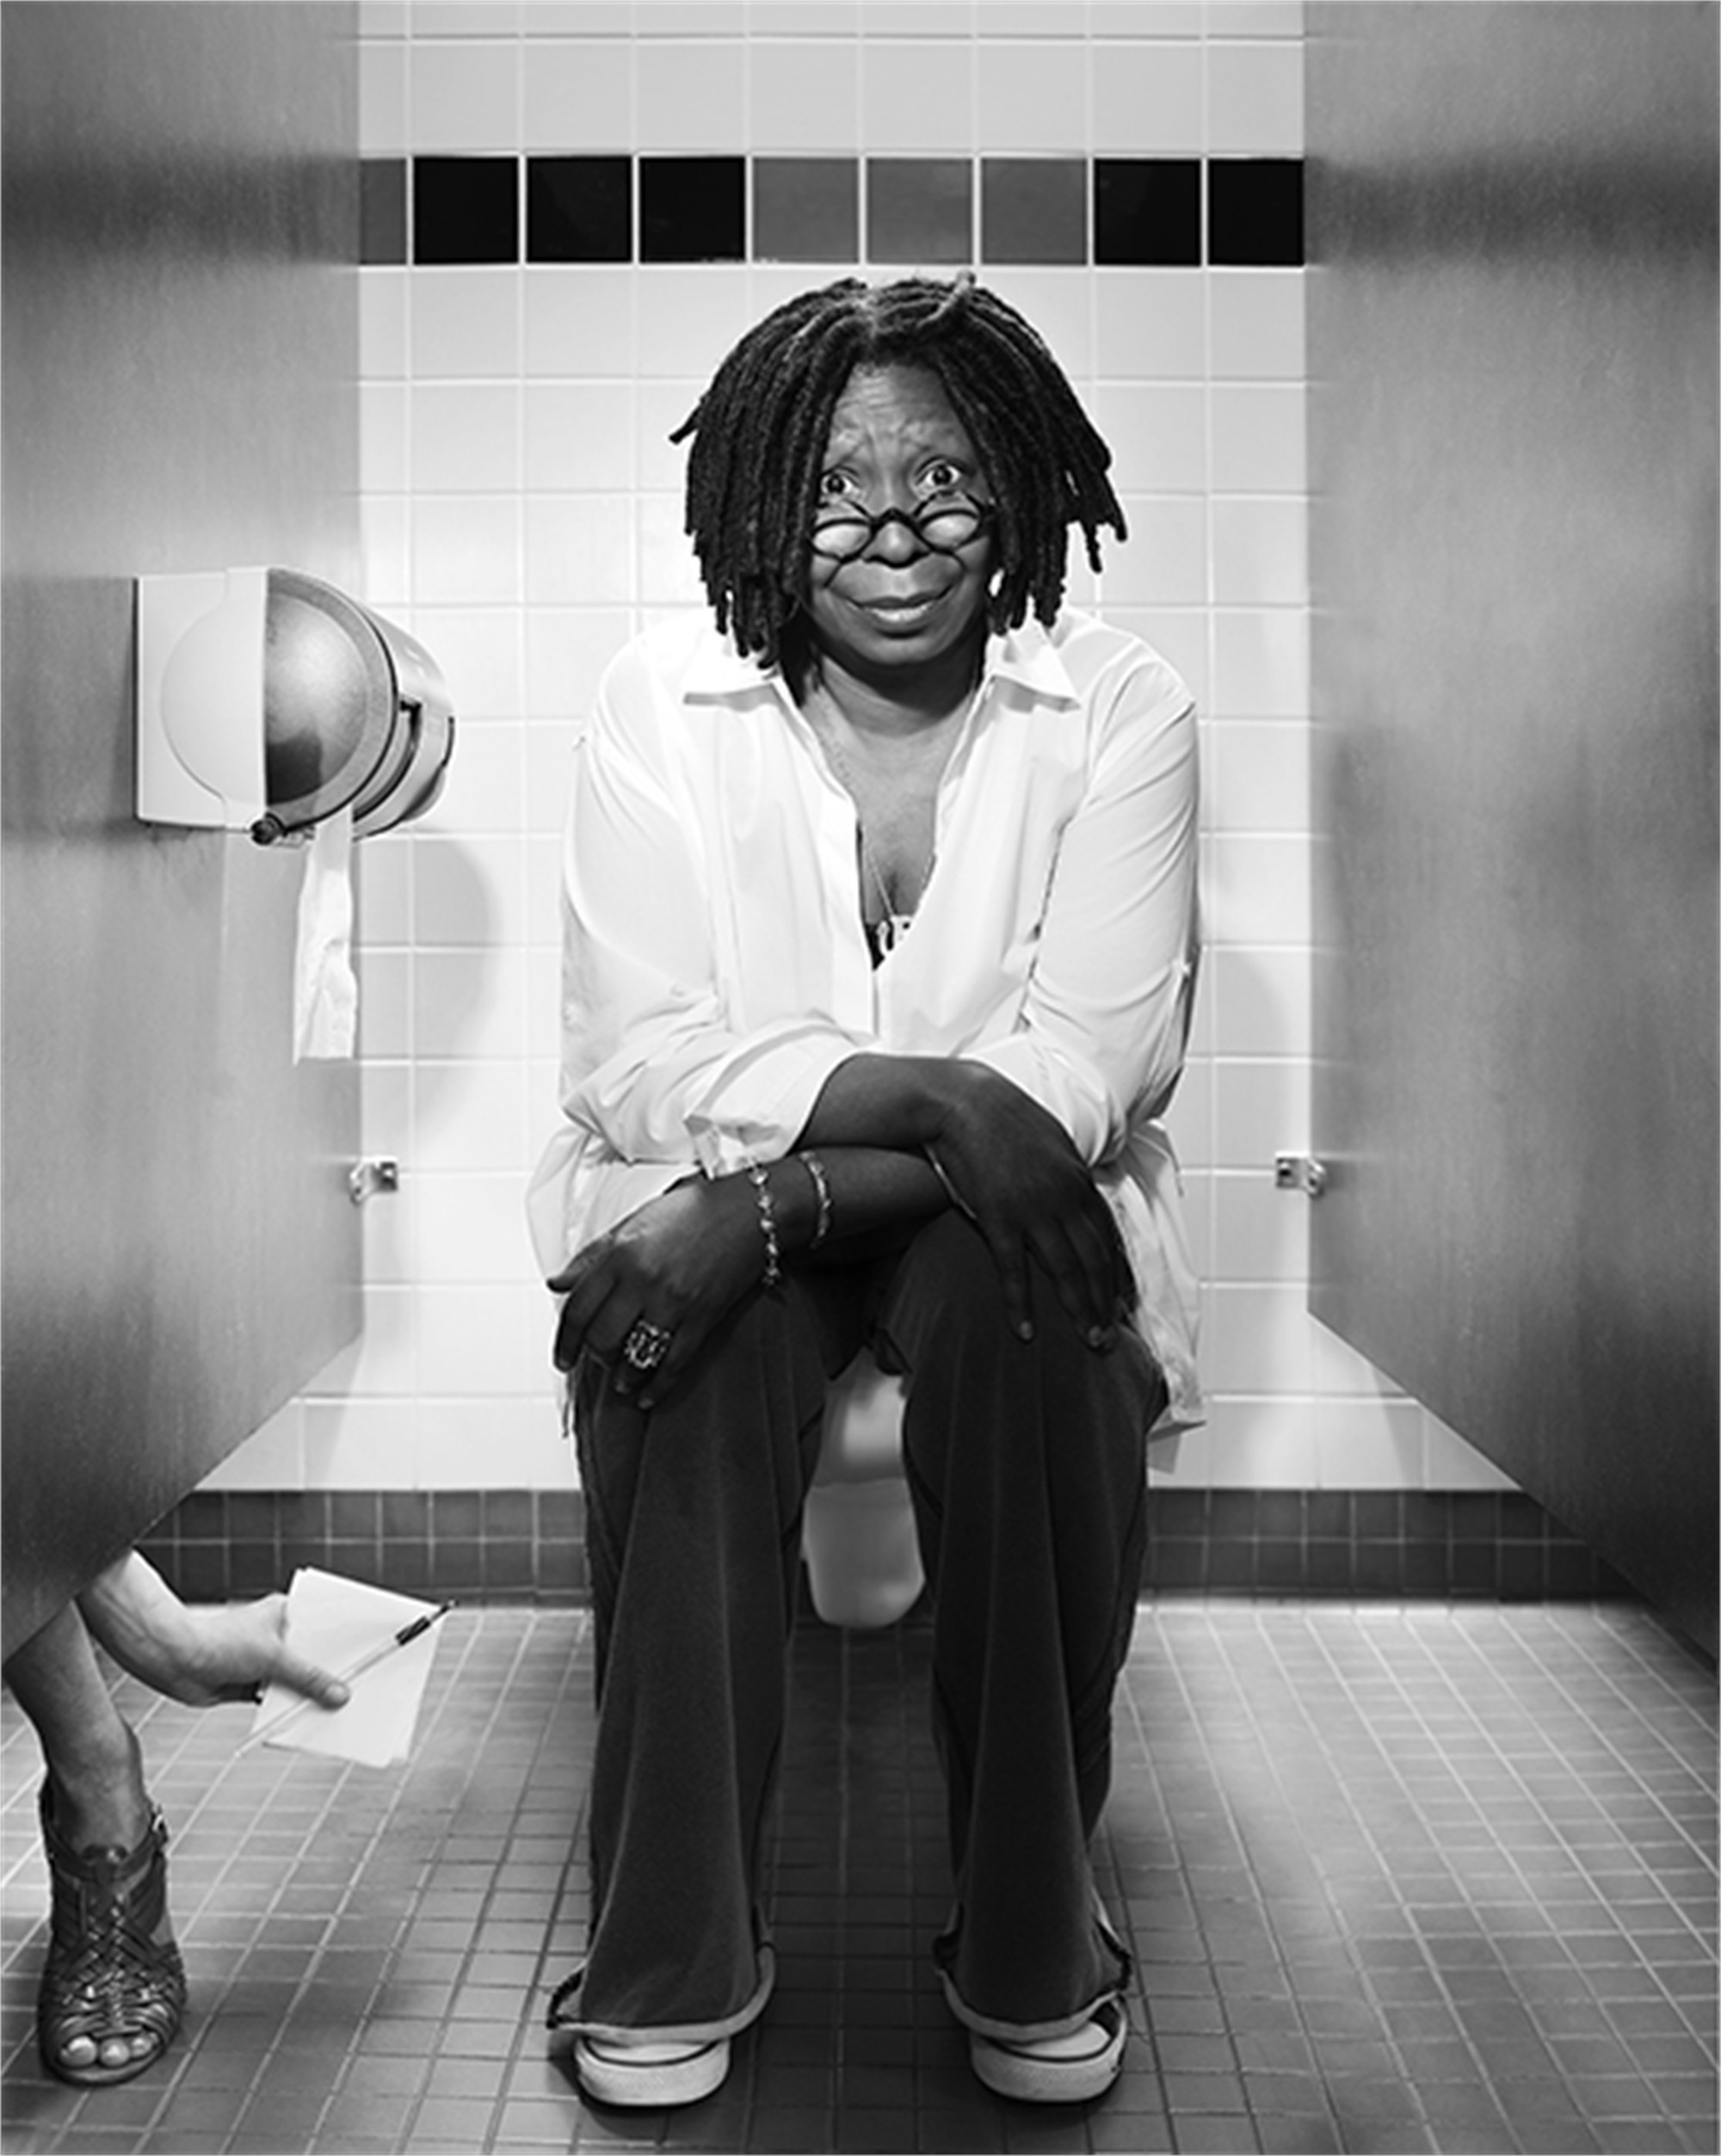 10009 Whoopi Goldberg Toilet 2010 BW | Whitelight Editions